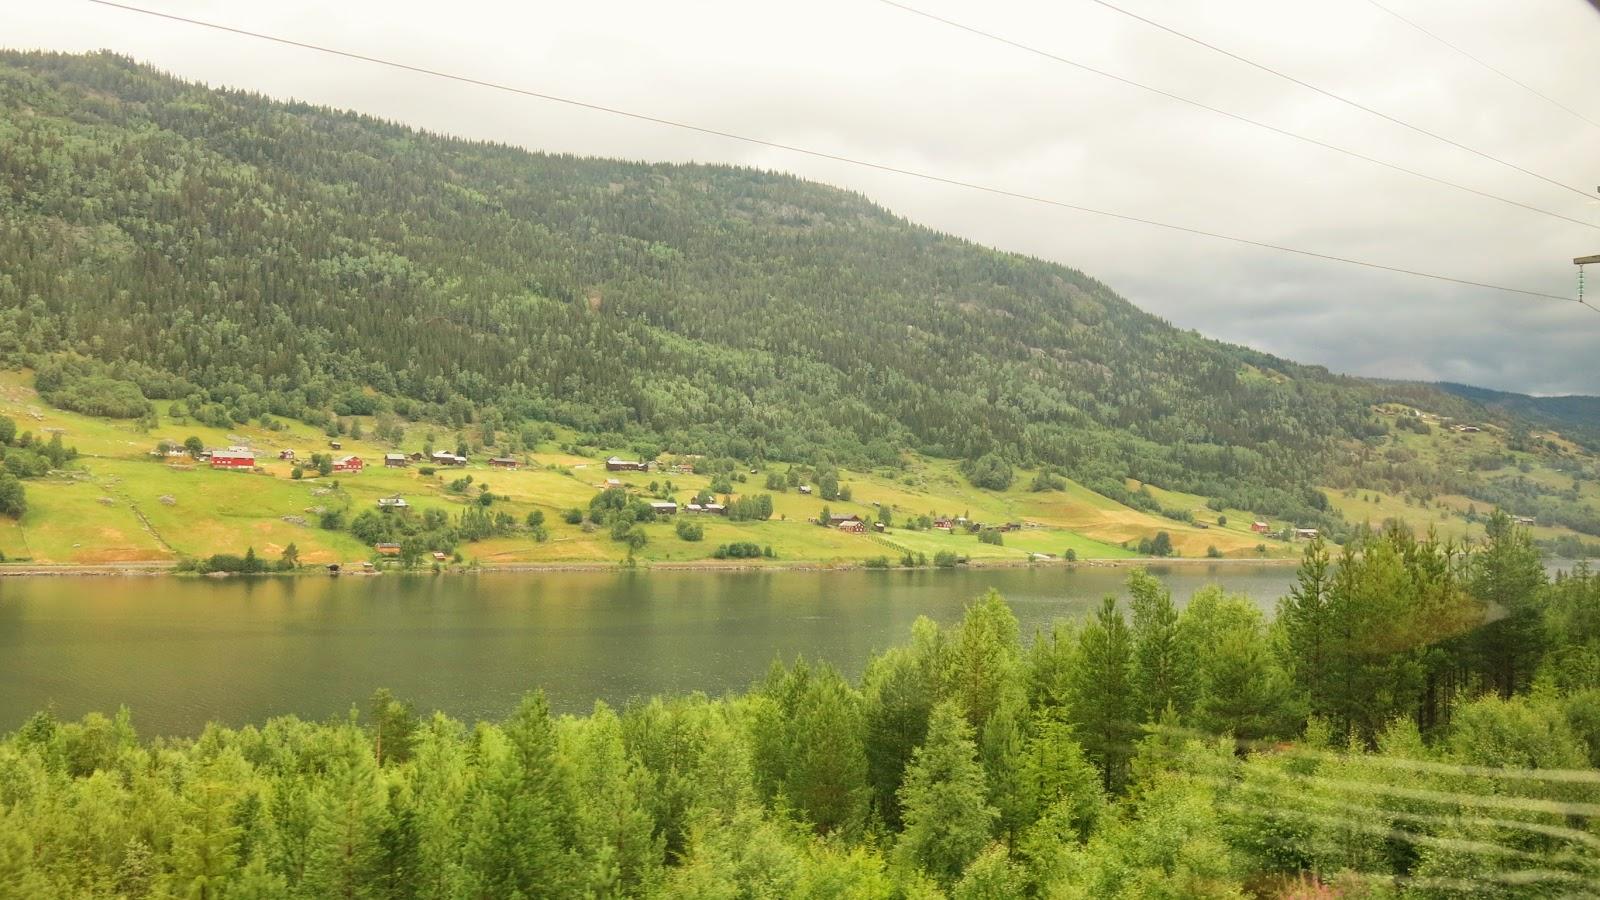 Bergensbanan